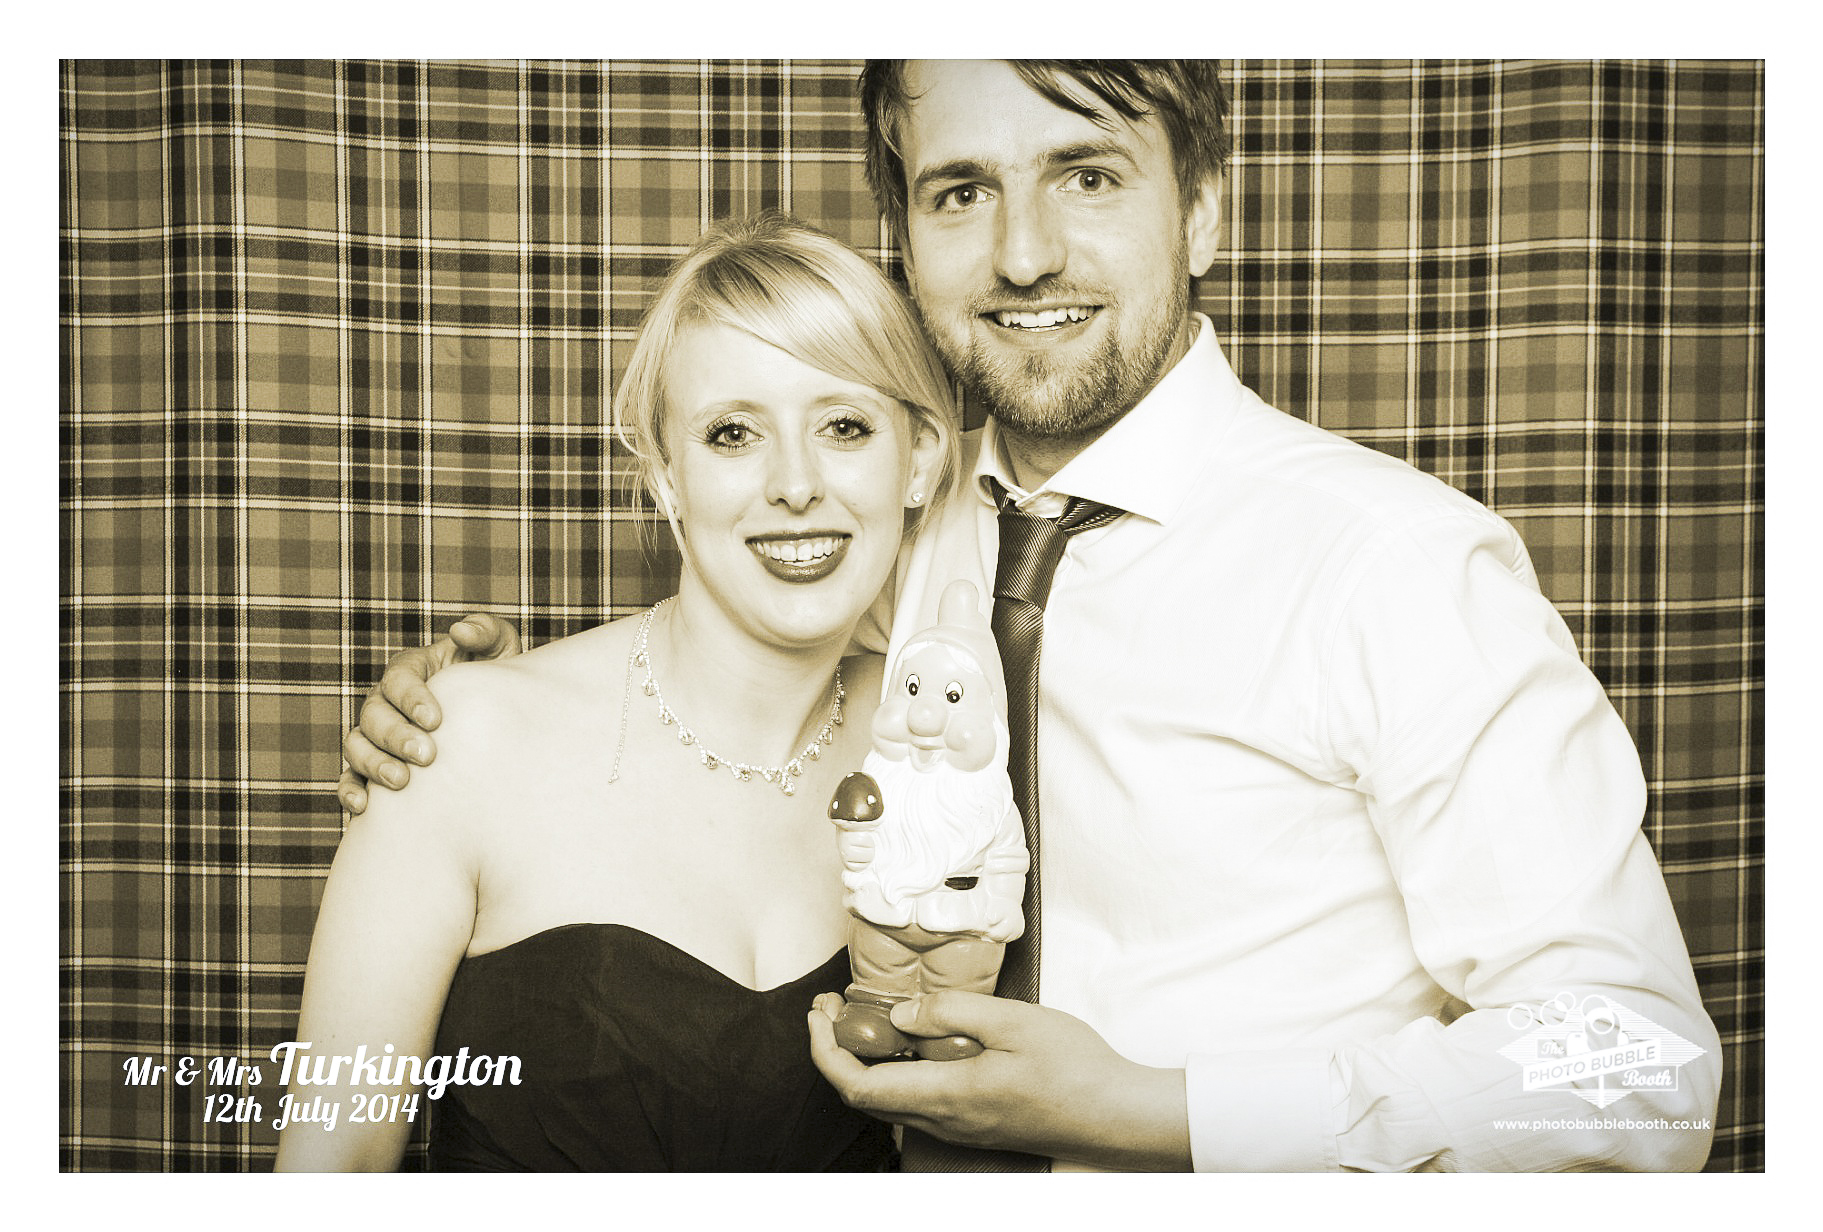 Mr & Mrs Turkington Photobooth _27.JPG